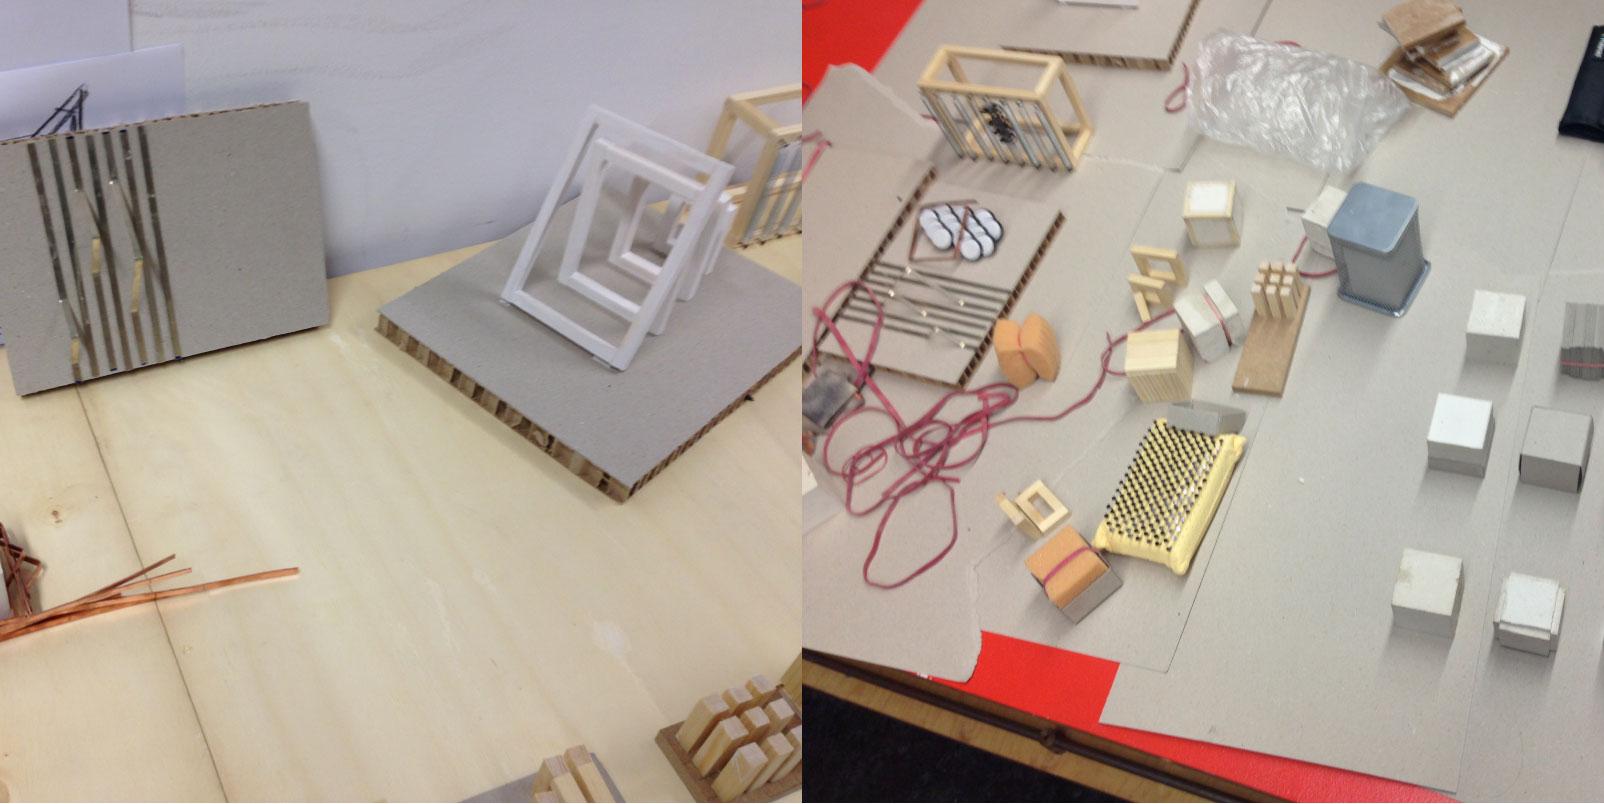 gerrit_schweiger-Nice_to_have-Must_have-unreachable-Accessoire-Accessory-Designprozess-Design_Thinking-Social_Design-Ausstellung-CAD-Raum-Illustration-Skulptur-Plakat-Typographie-Marke-Inspiration-6